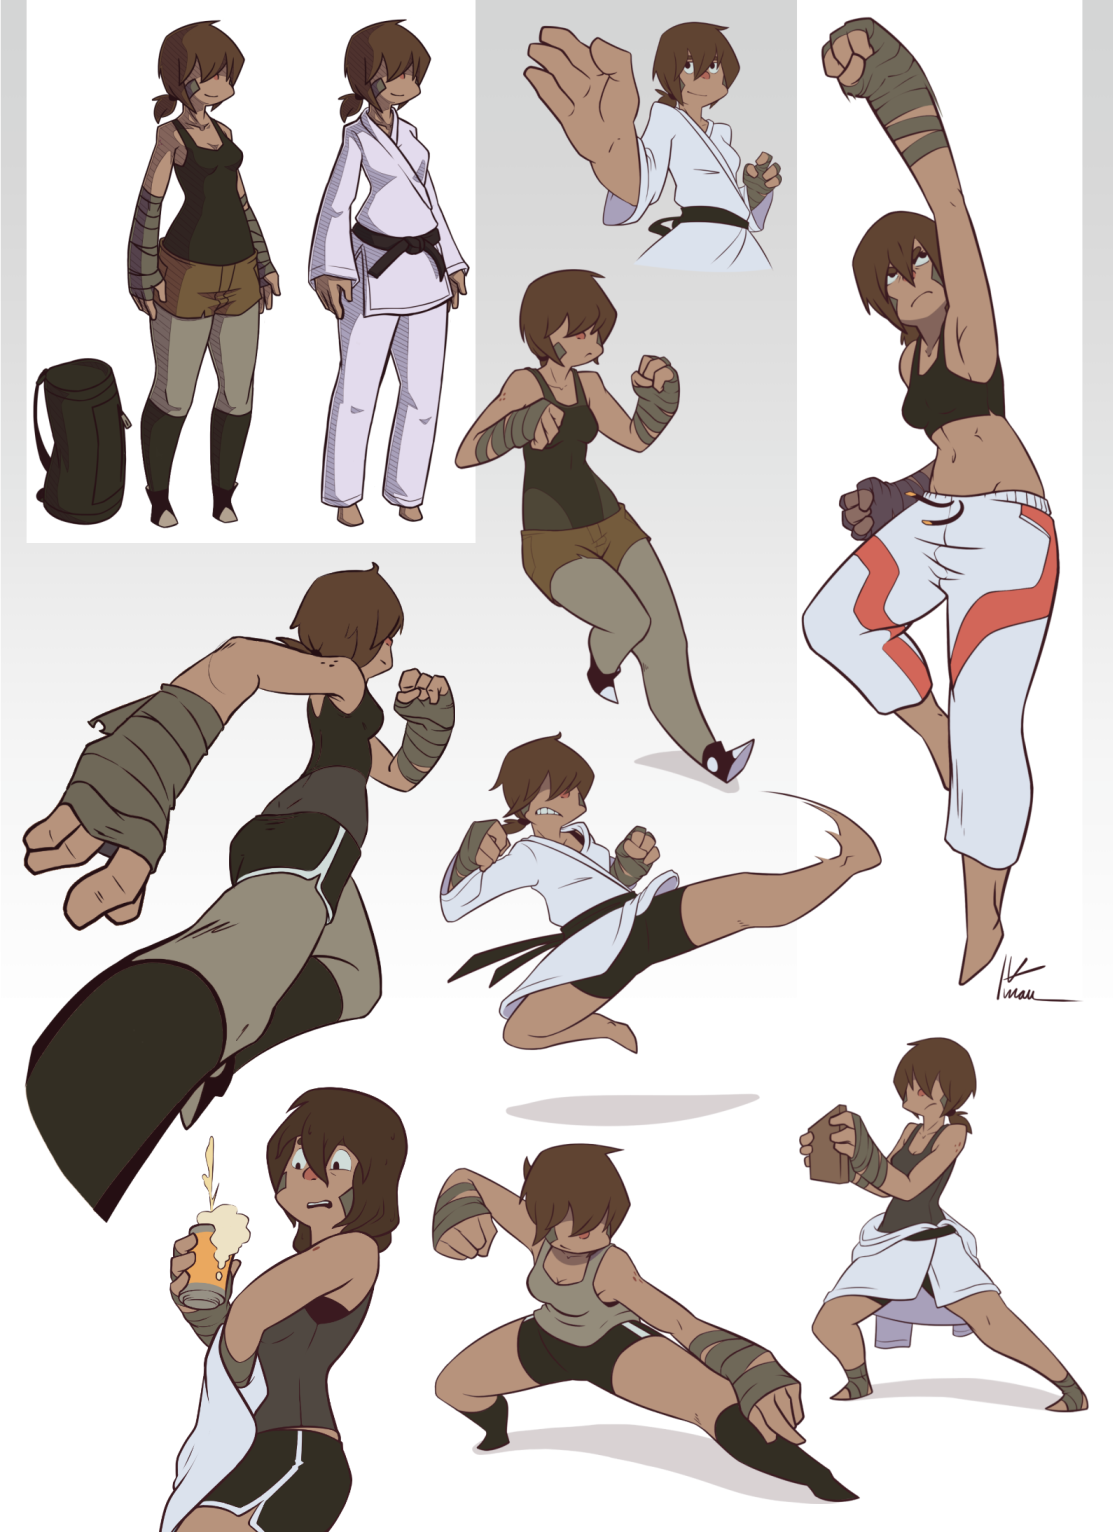 Scruffy character drawings